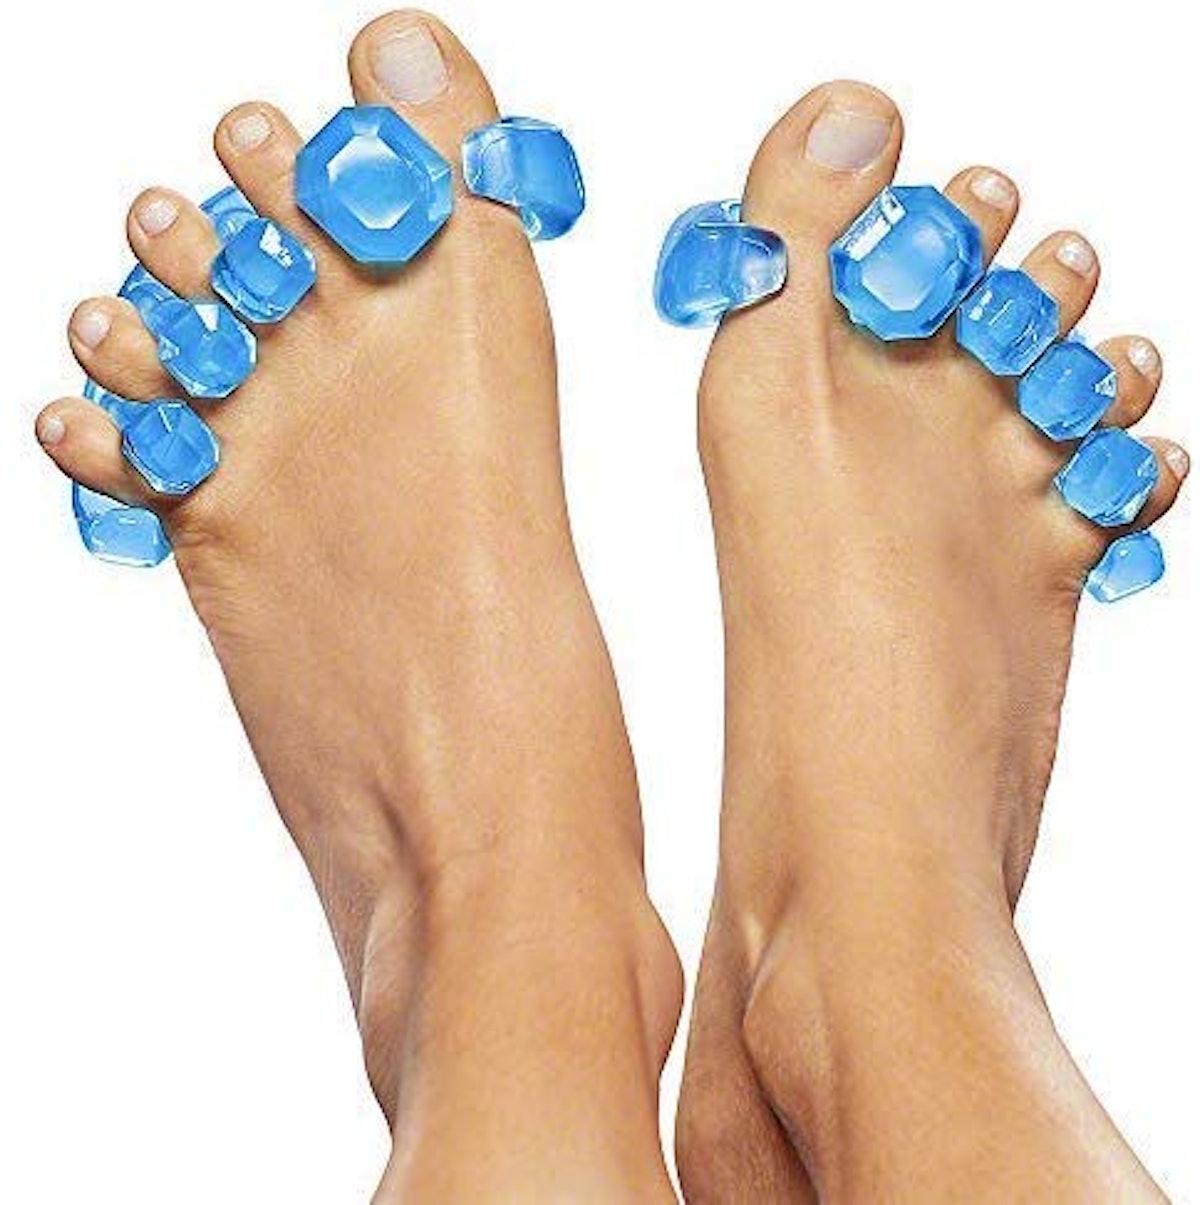 Yoga Toes Toe Stretchers (2-Pack)